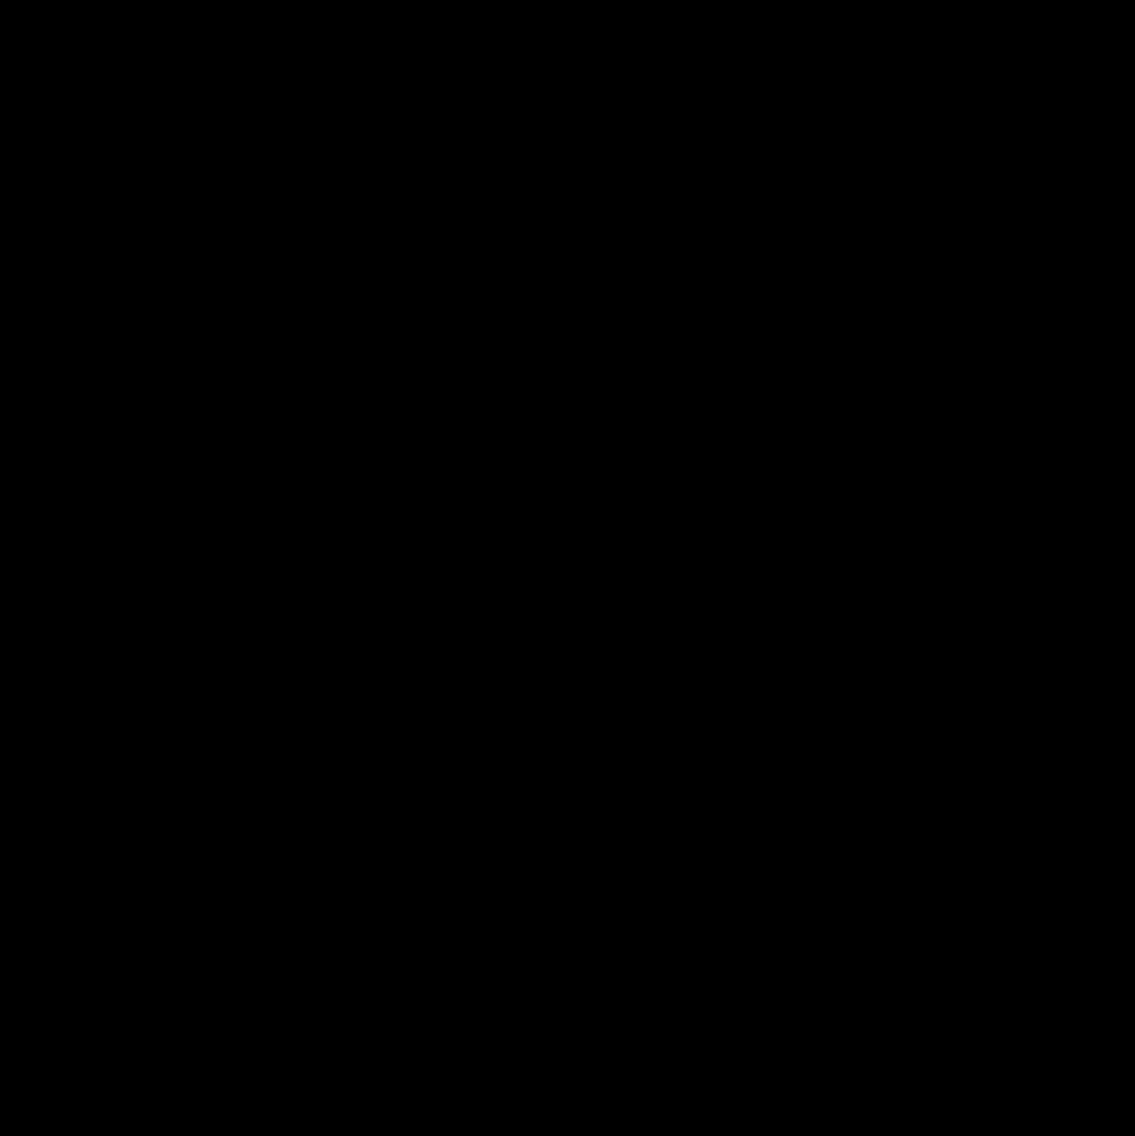 1135x1136 Mercury Planet Clipart Black And White